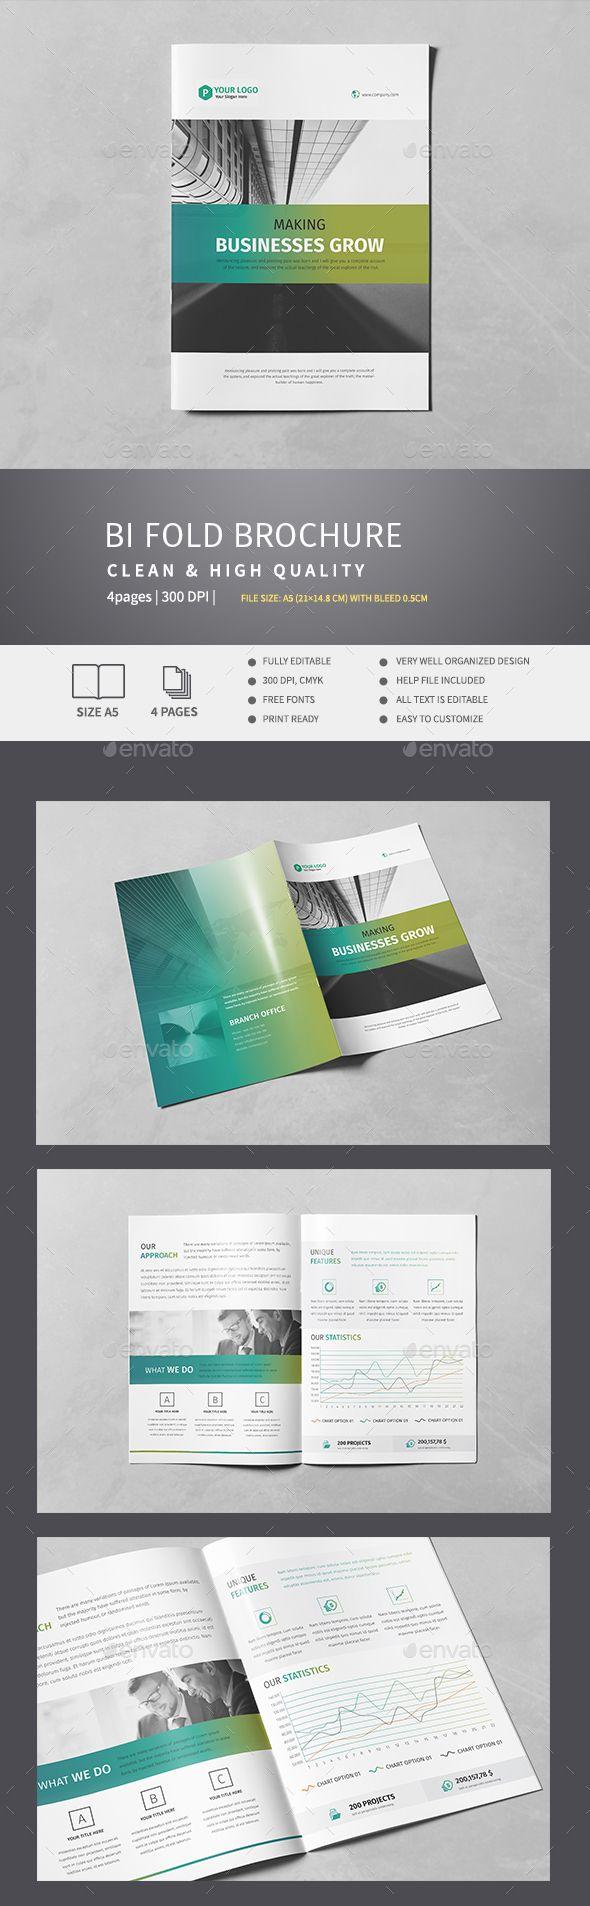 Corporate Bi-Fold Brochure Template InDesign INDD. Download here: http://graphicriver.net/item/corporate-bifold-brochure-v2/15102689?ref=ksioks